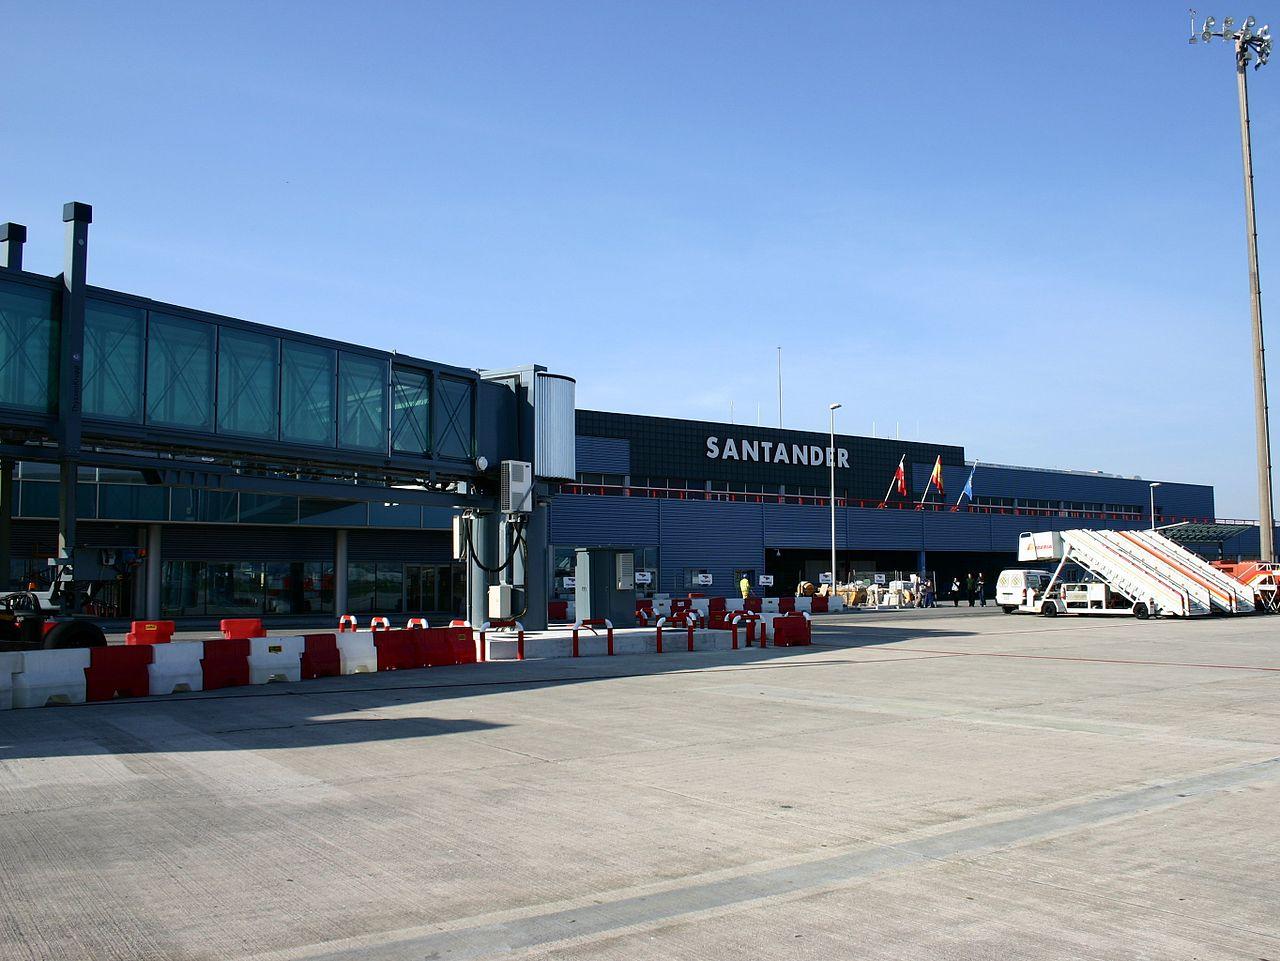 Aeropuerto Severiano Ballesteros